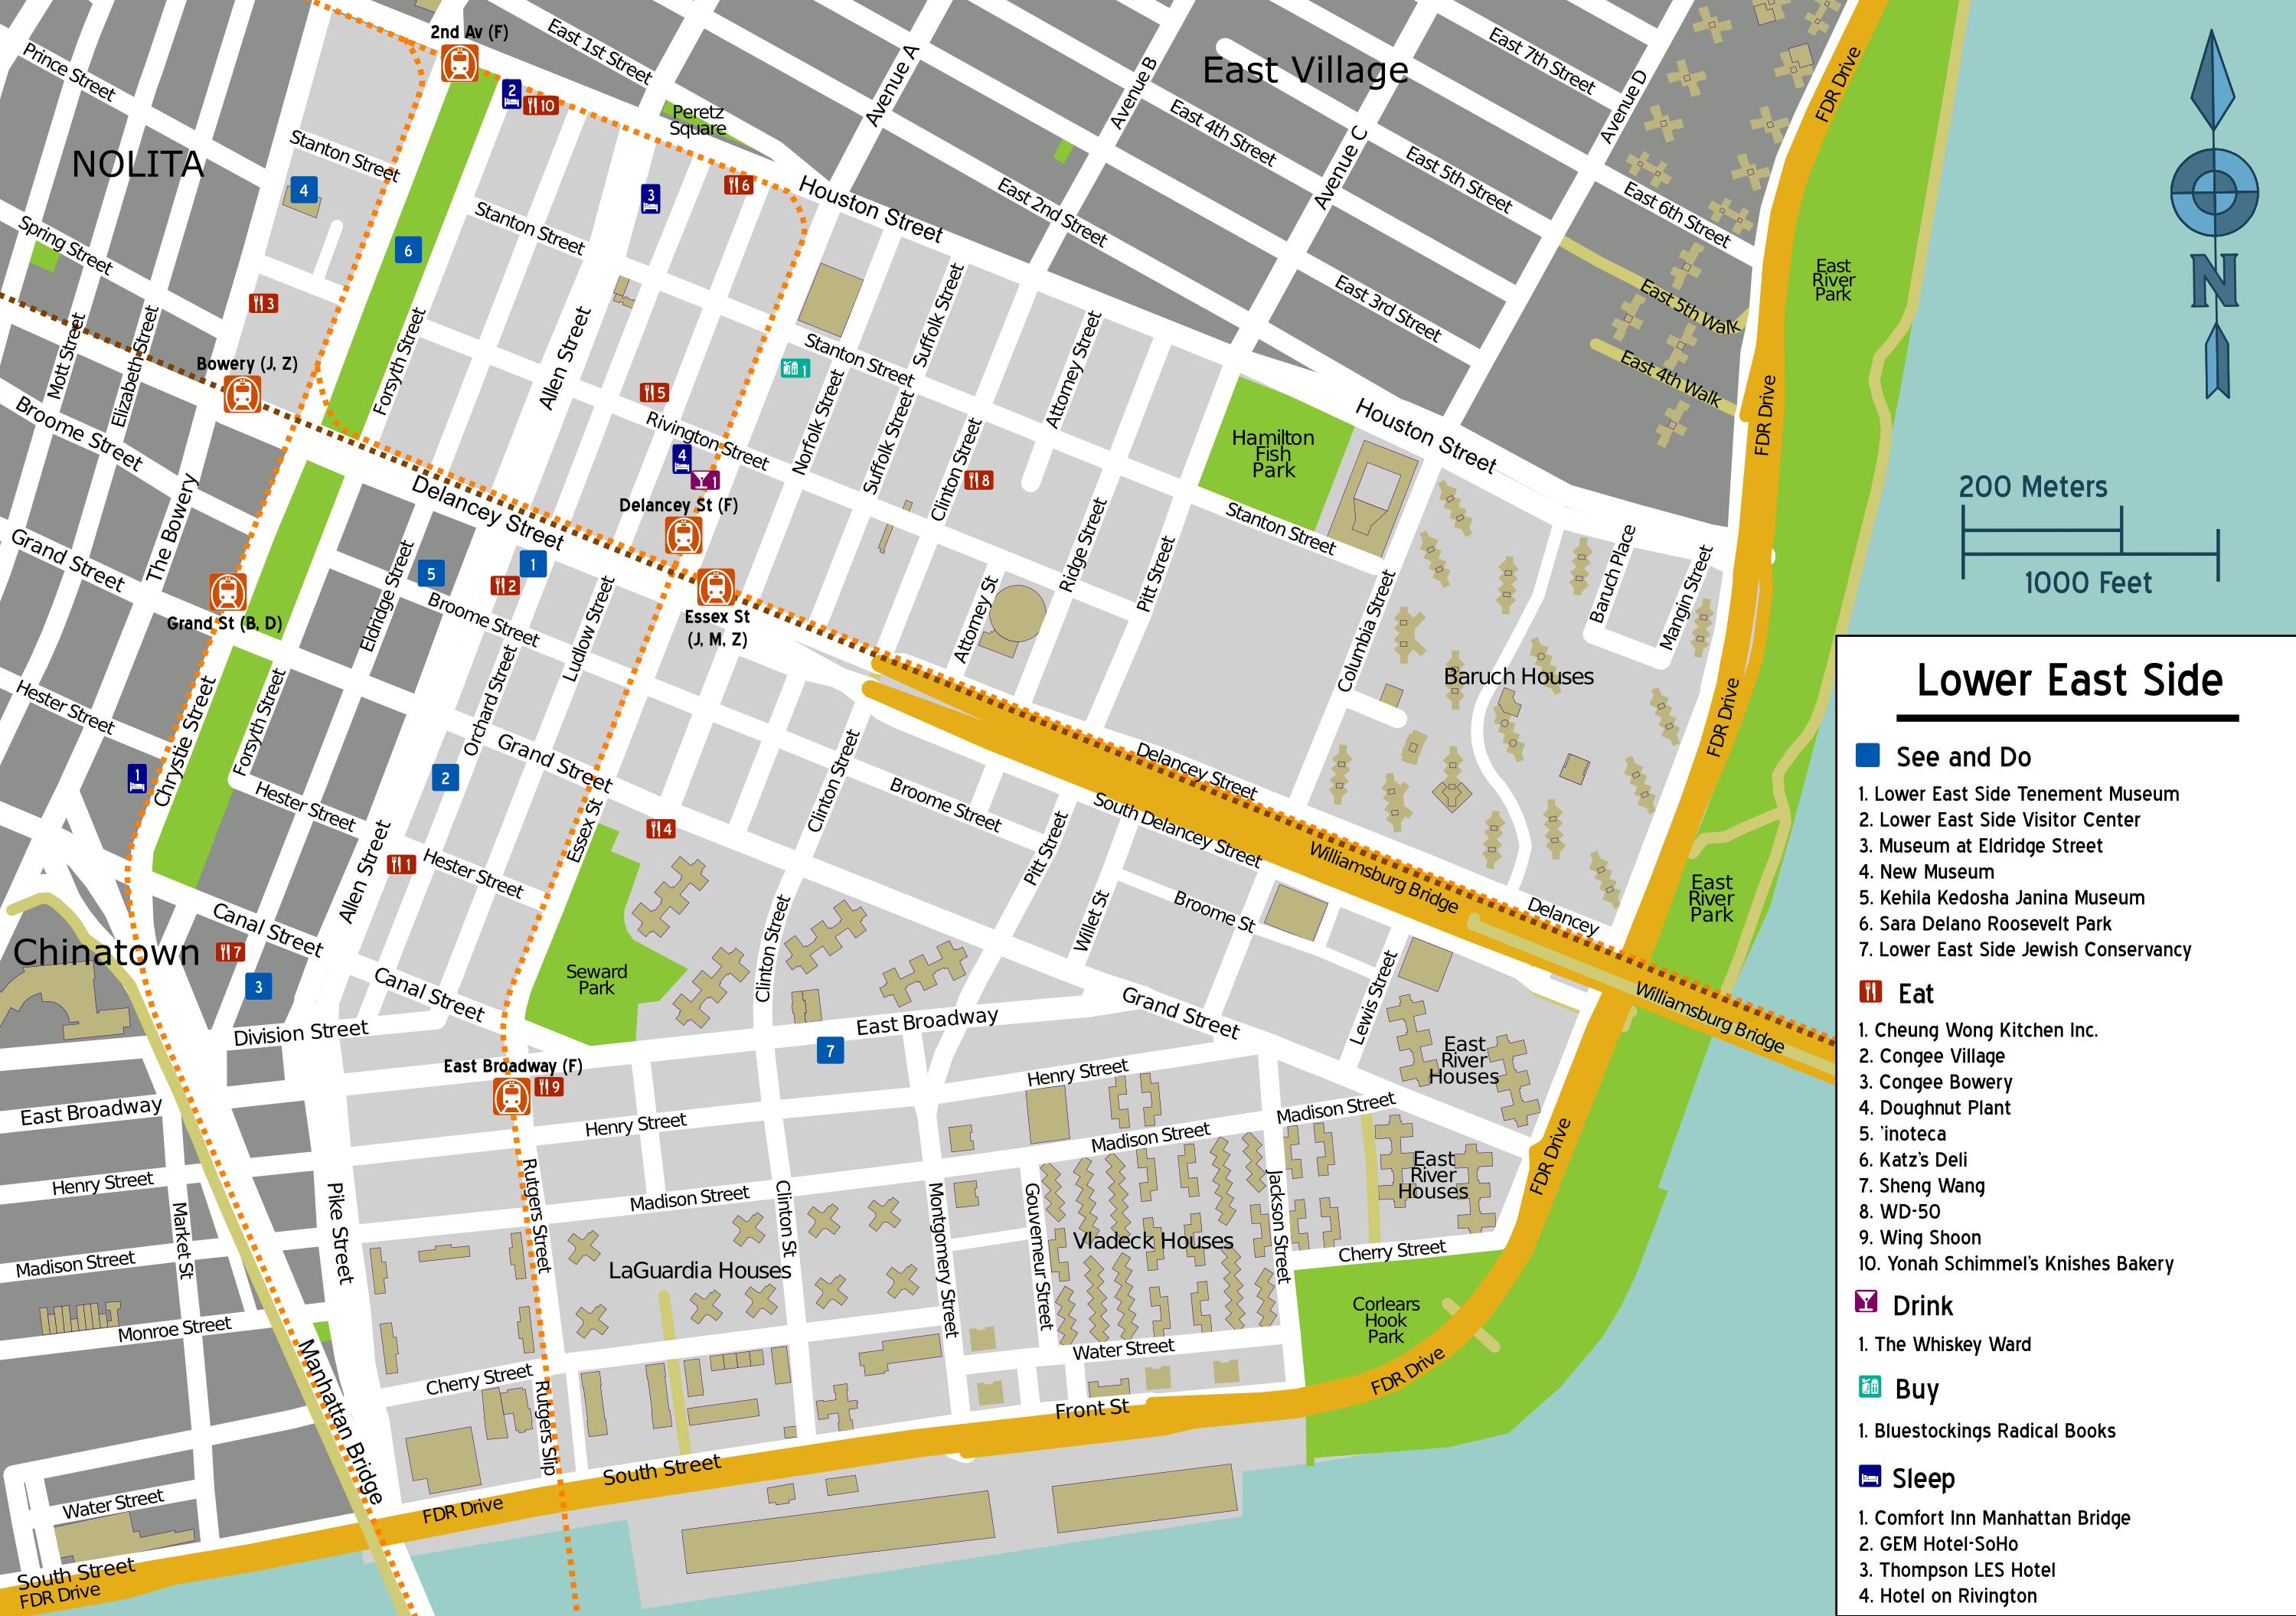 File:Lowereastside map.png - Wikimedia Commons